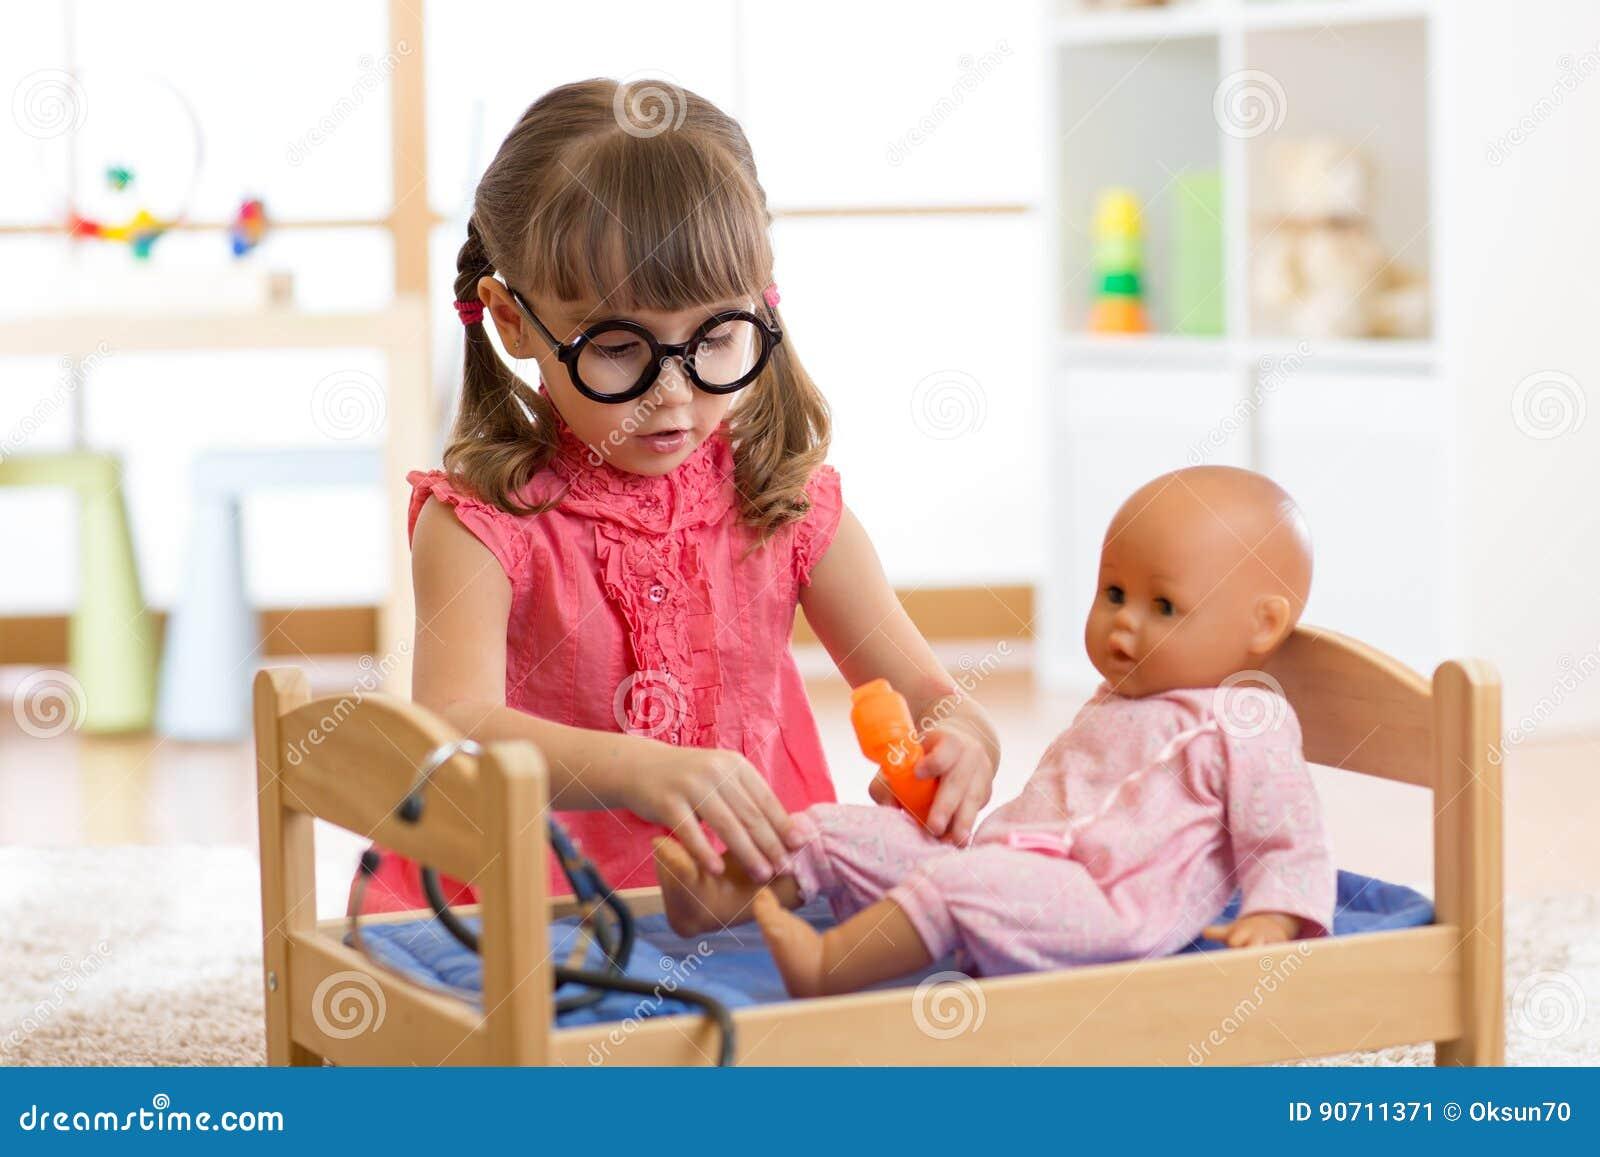 459b176ef7bd3 Child in kindergarten. Kid in nursery school. Little girl playing doctor with  doll